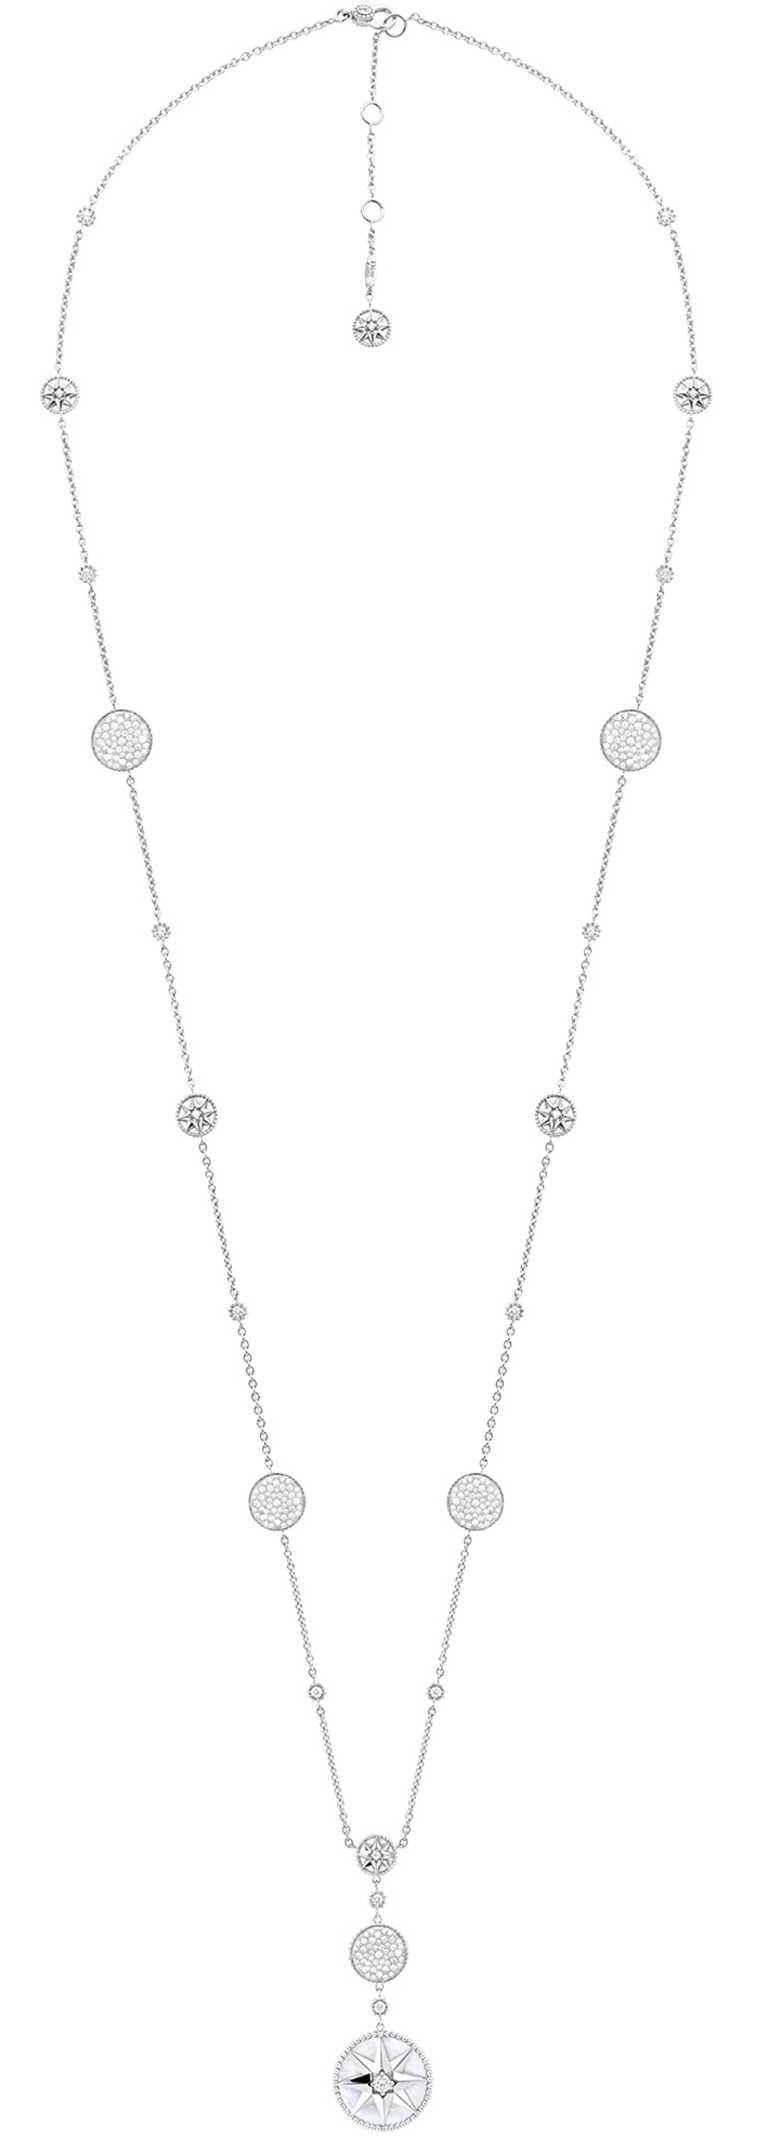 DIOR「Rose des Vents羅盤玫瑰」系列,白K金珍珠母貝鑽石長項鍊╱1,550,000元。(圖╱DIOR提供)